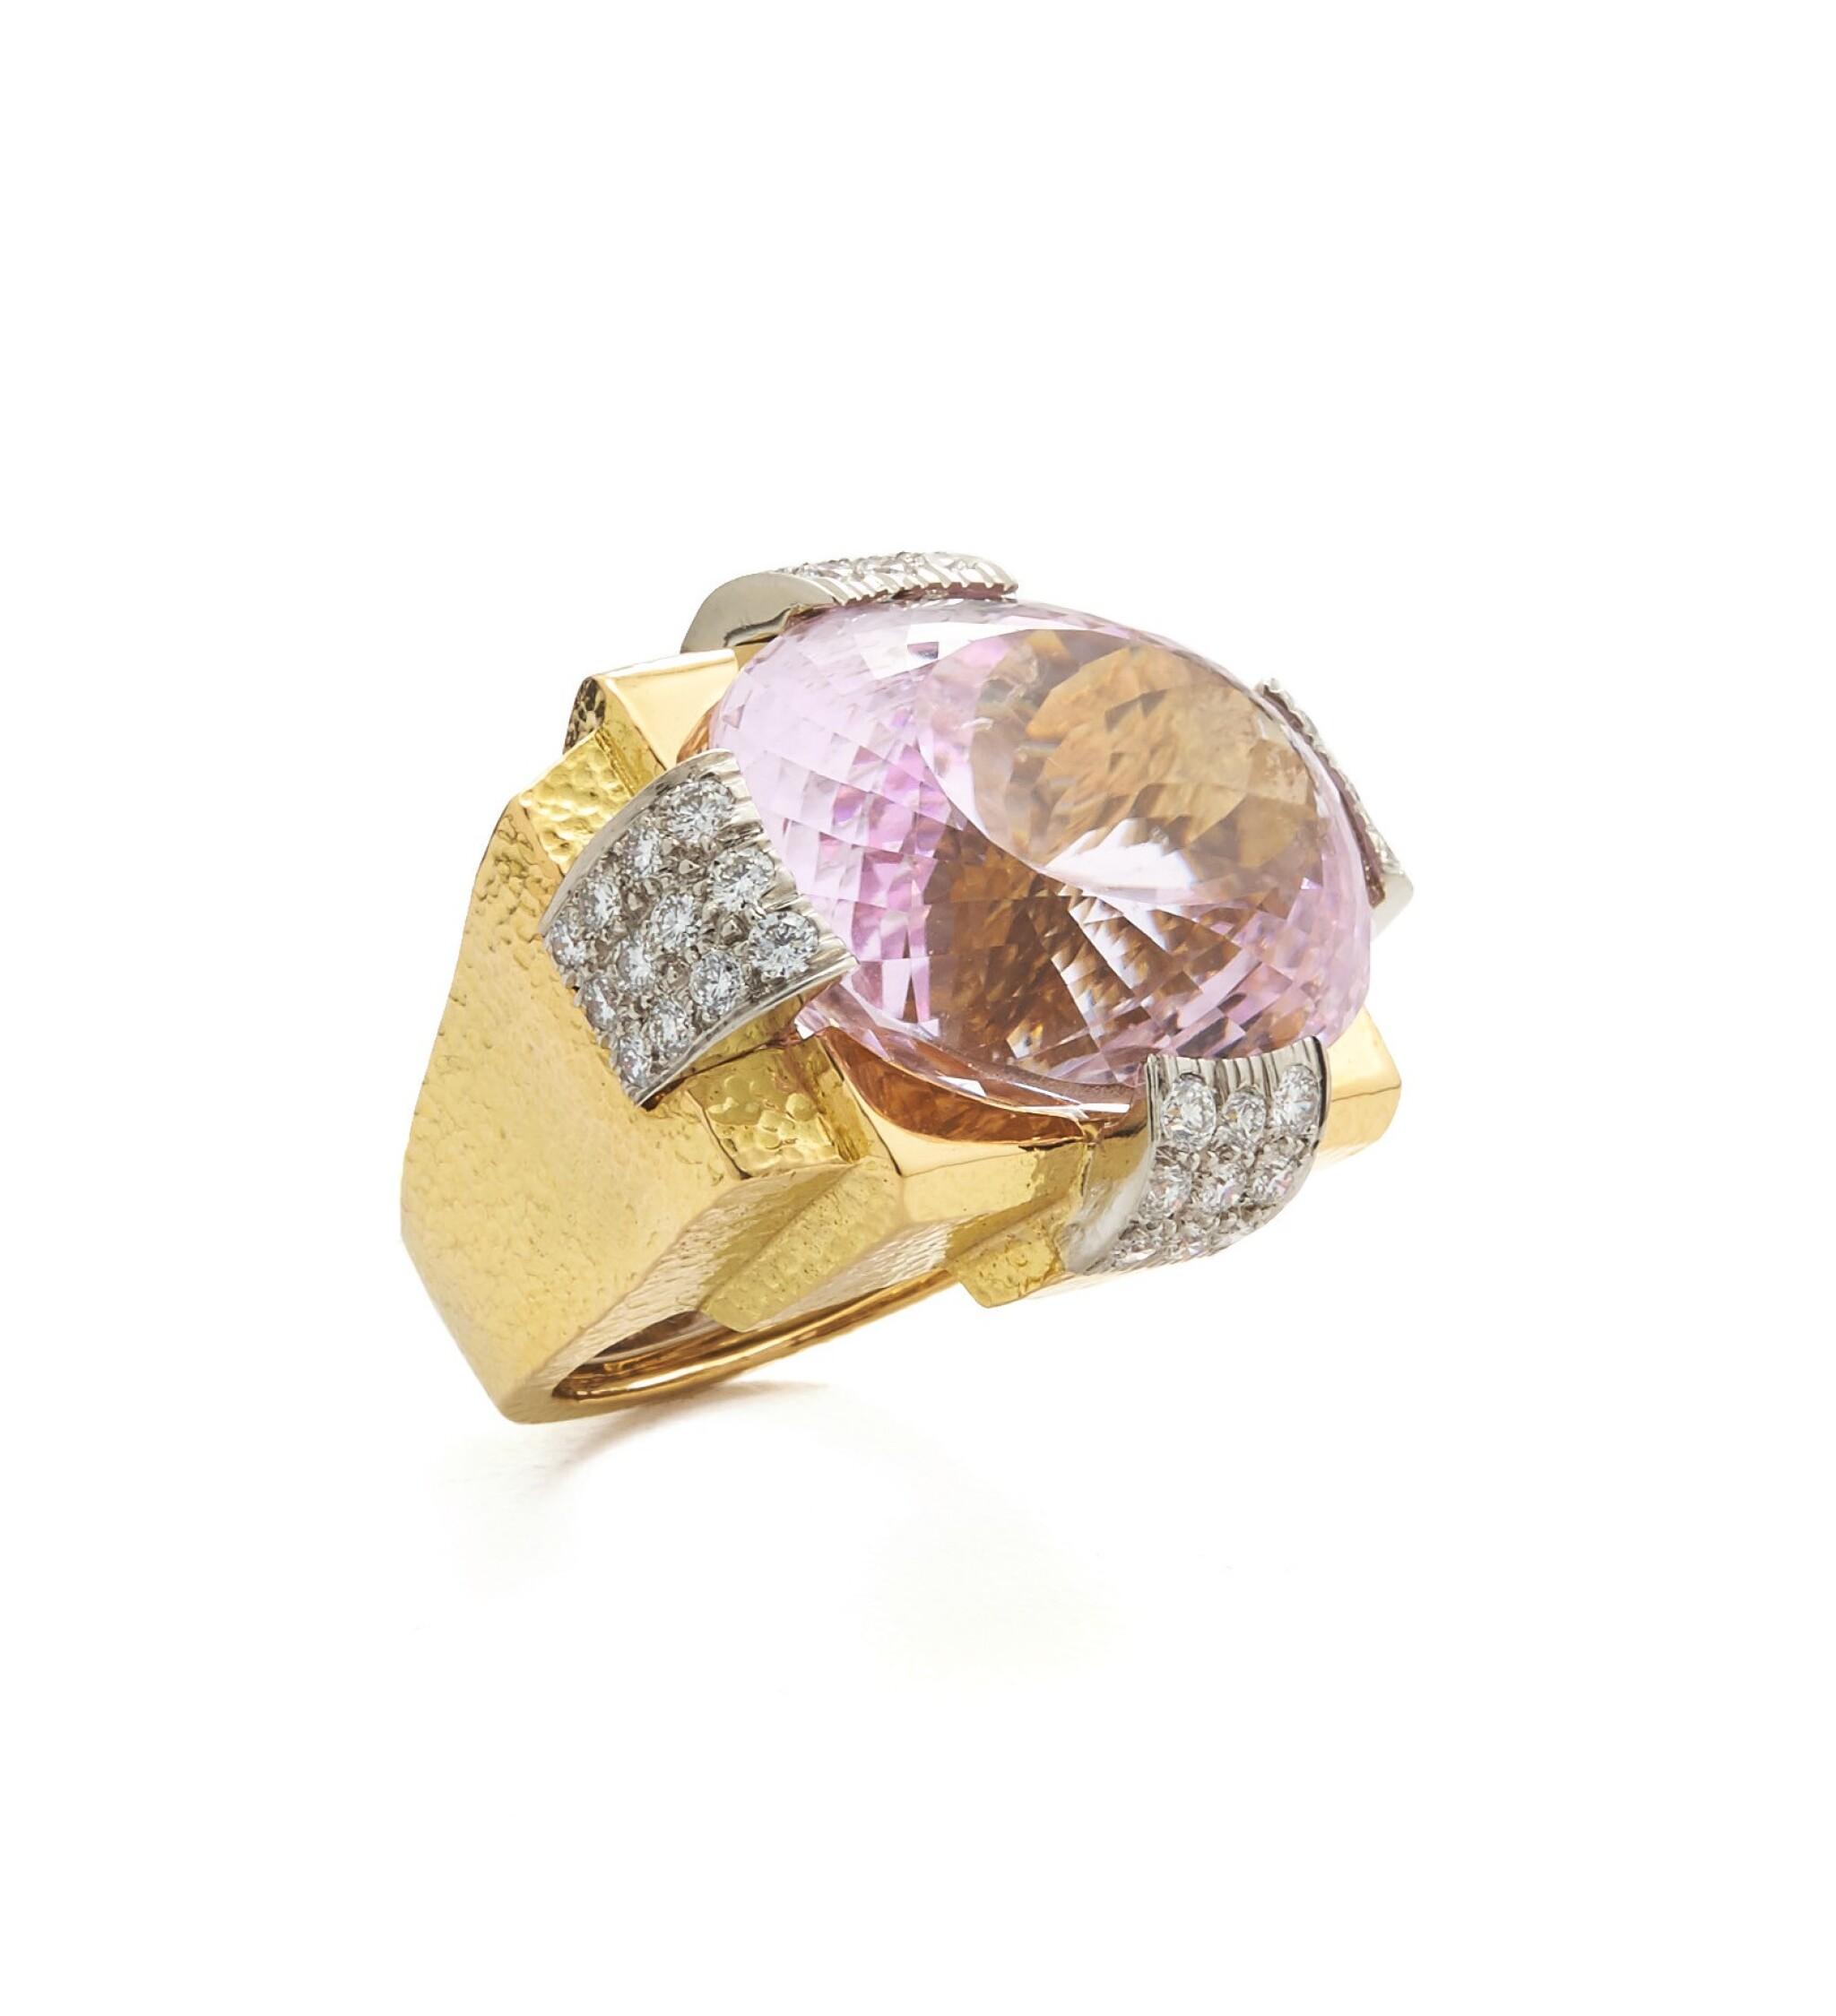 View full screen - View 1 of Lot 83. DAVID WEBB | GOLD, KUNZITE AND DIAMOND RING.